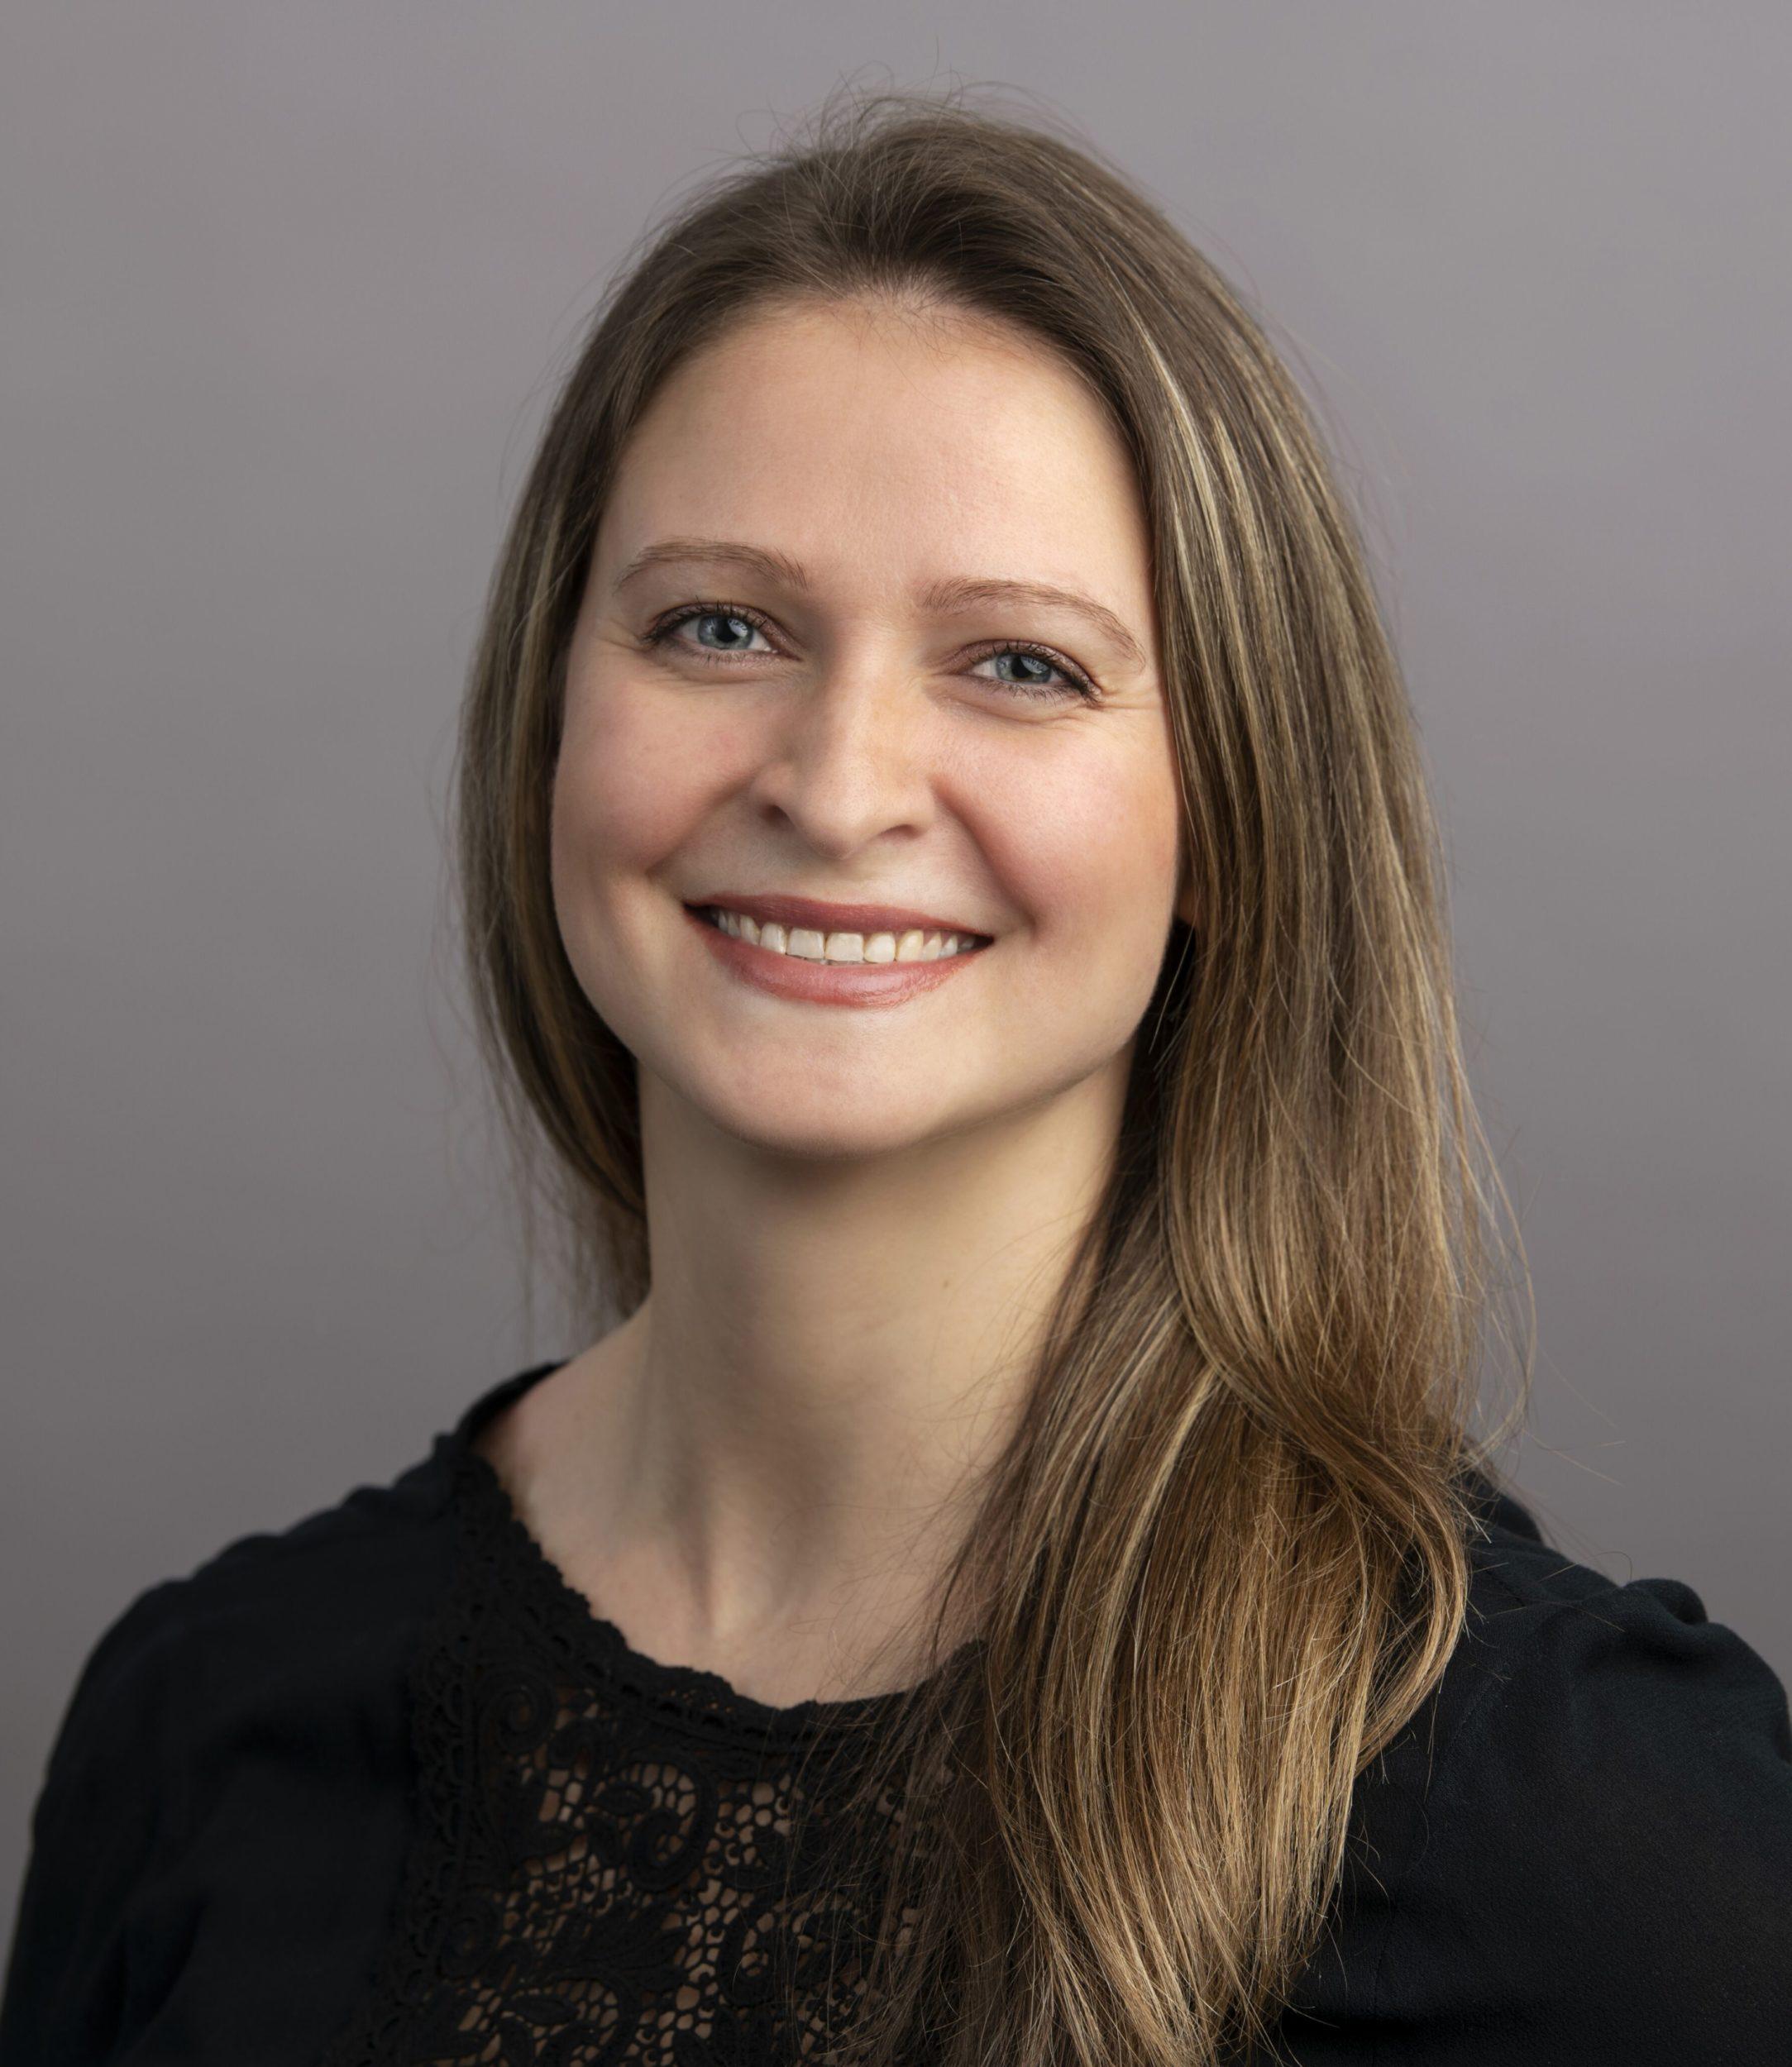 Samantha Rahn O'Neill